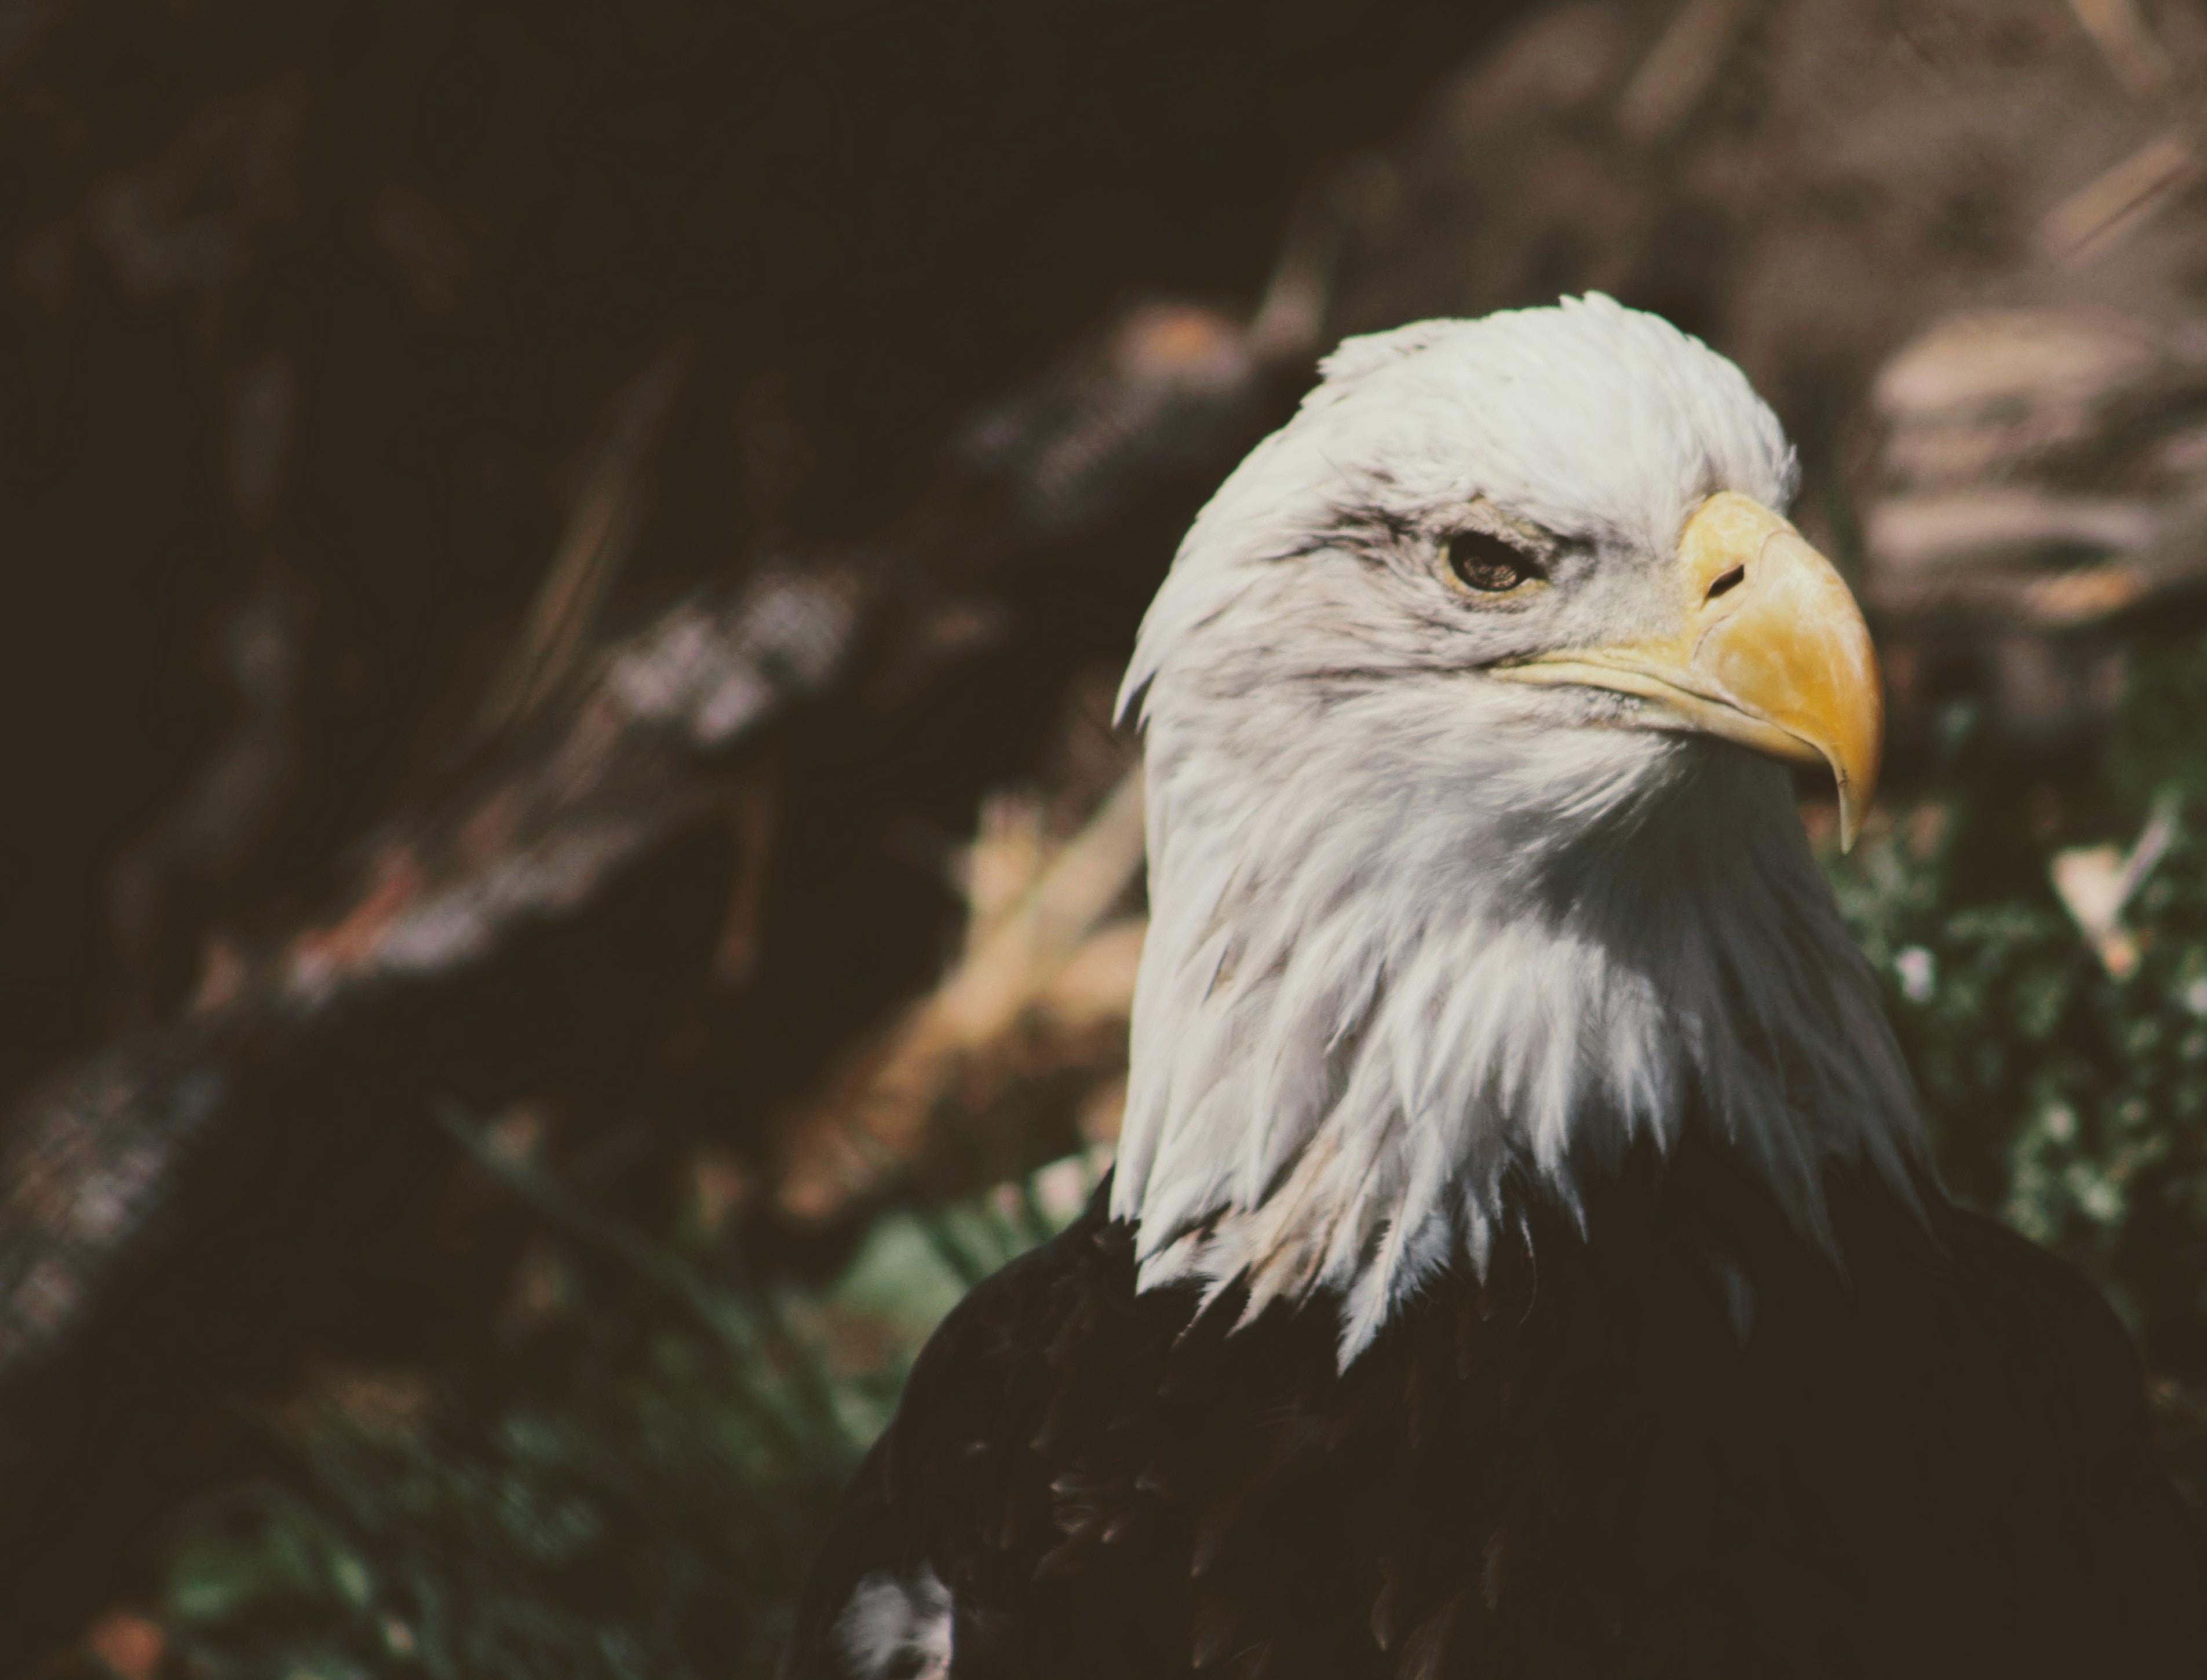 Bald eagle in macro photography